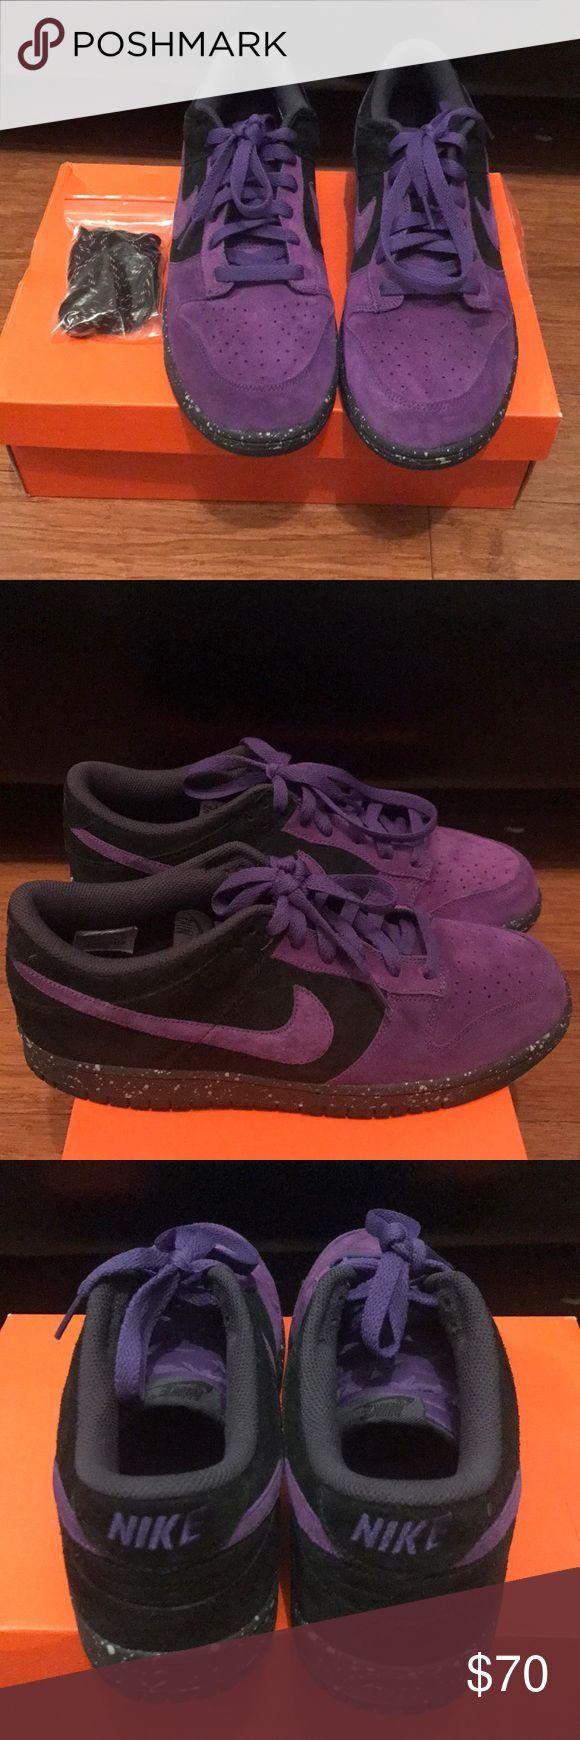 Men's Nike Dunk Low Purple and Black Suede Sz 11 Selling Nike Dunks size 11. Black and purple suede. Extra shoelaces. Excellent Condition. Nike Shoes Sneakers